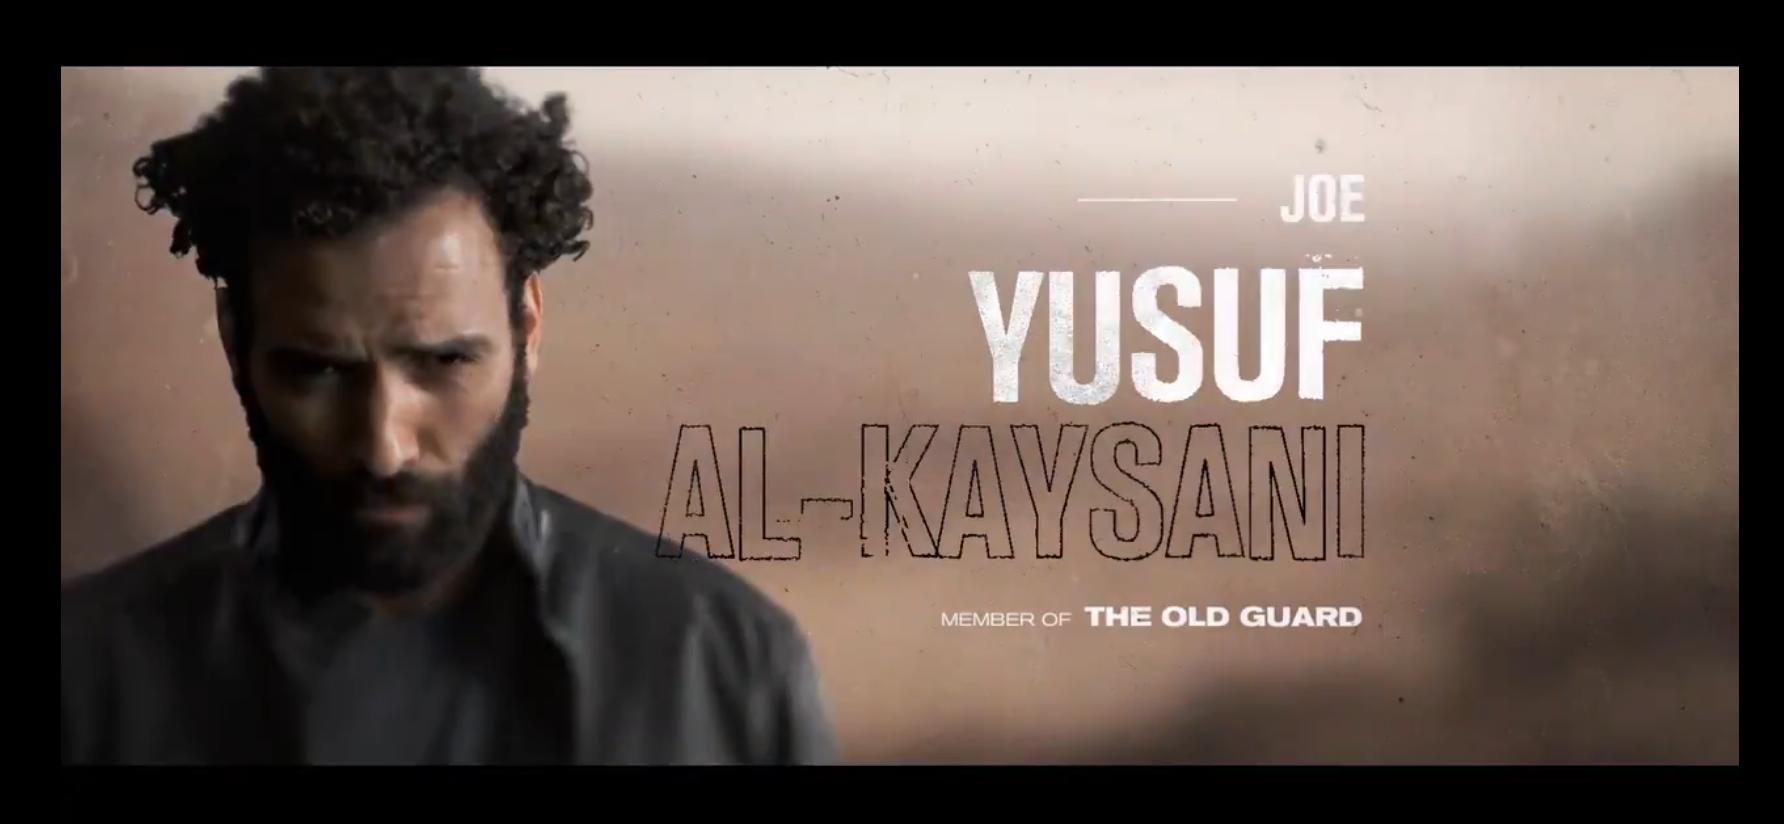 Yusuf Ibrahim Muhammad Al-Kaysani - Joe